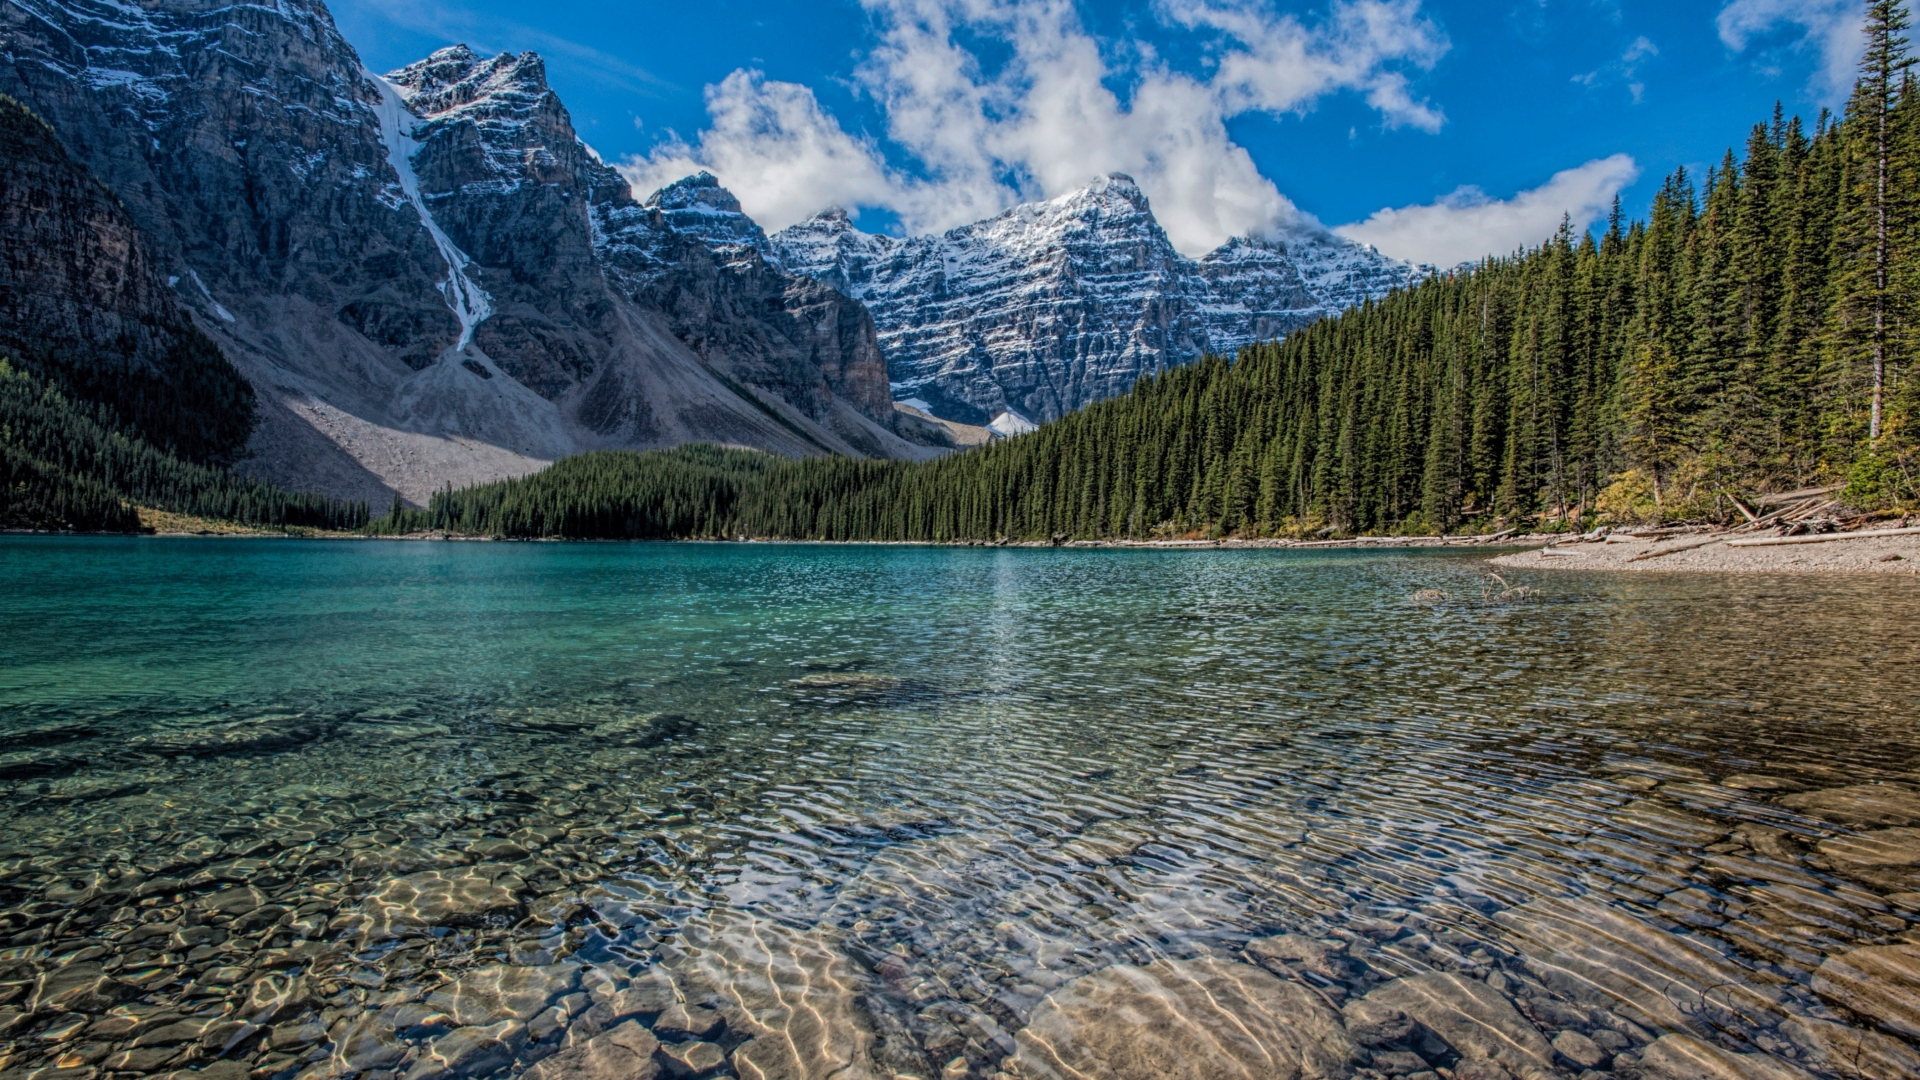 Download 1920x1080 Wallpaper Clean Lake Mountains Range Trees